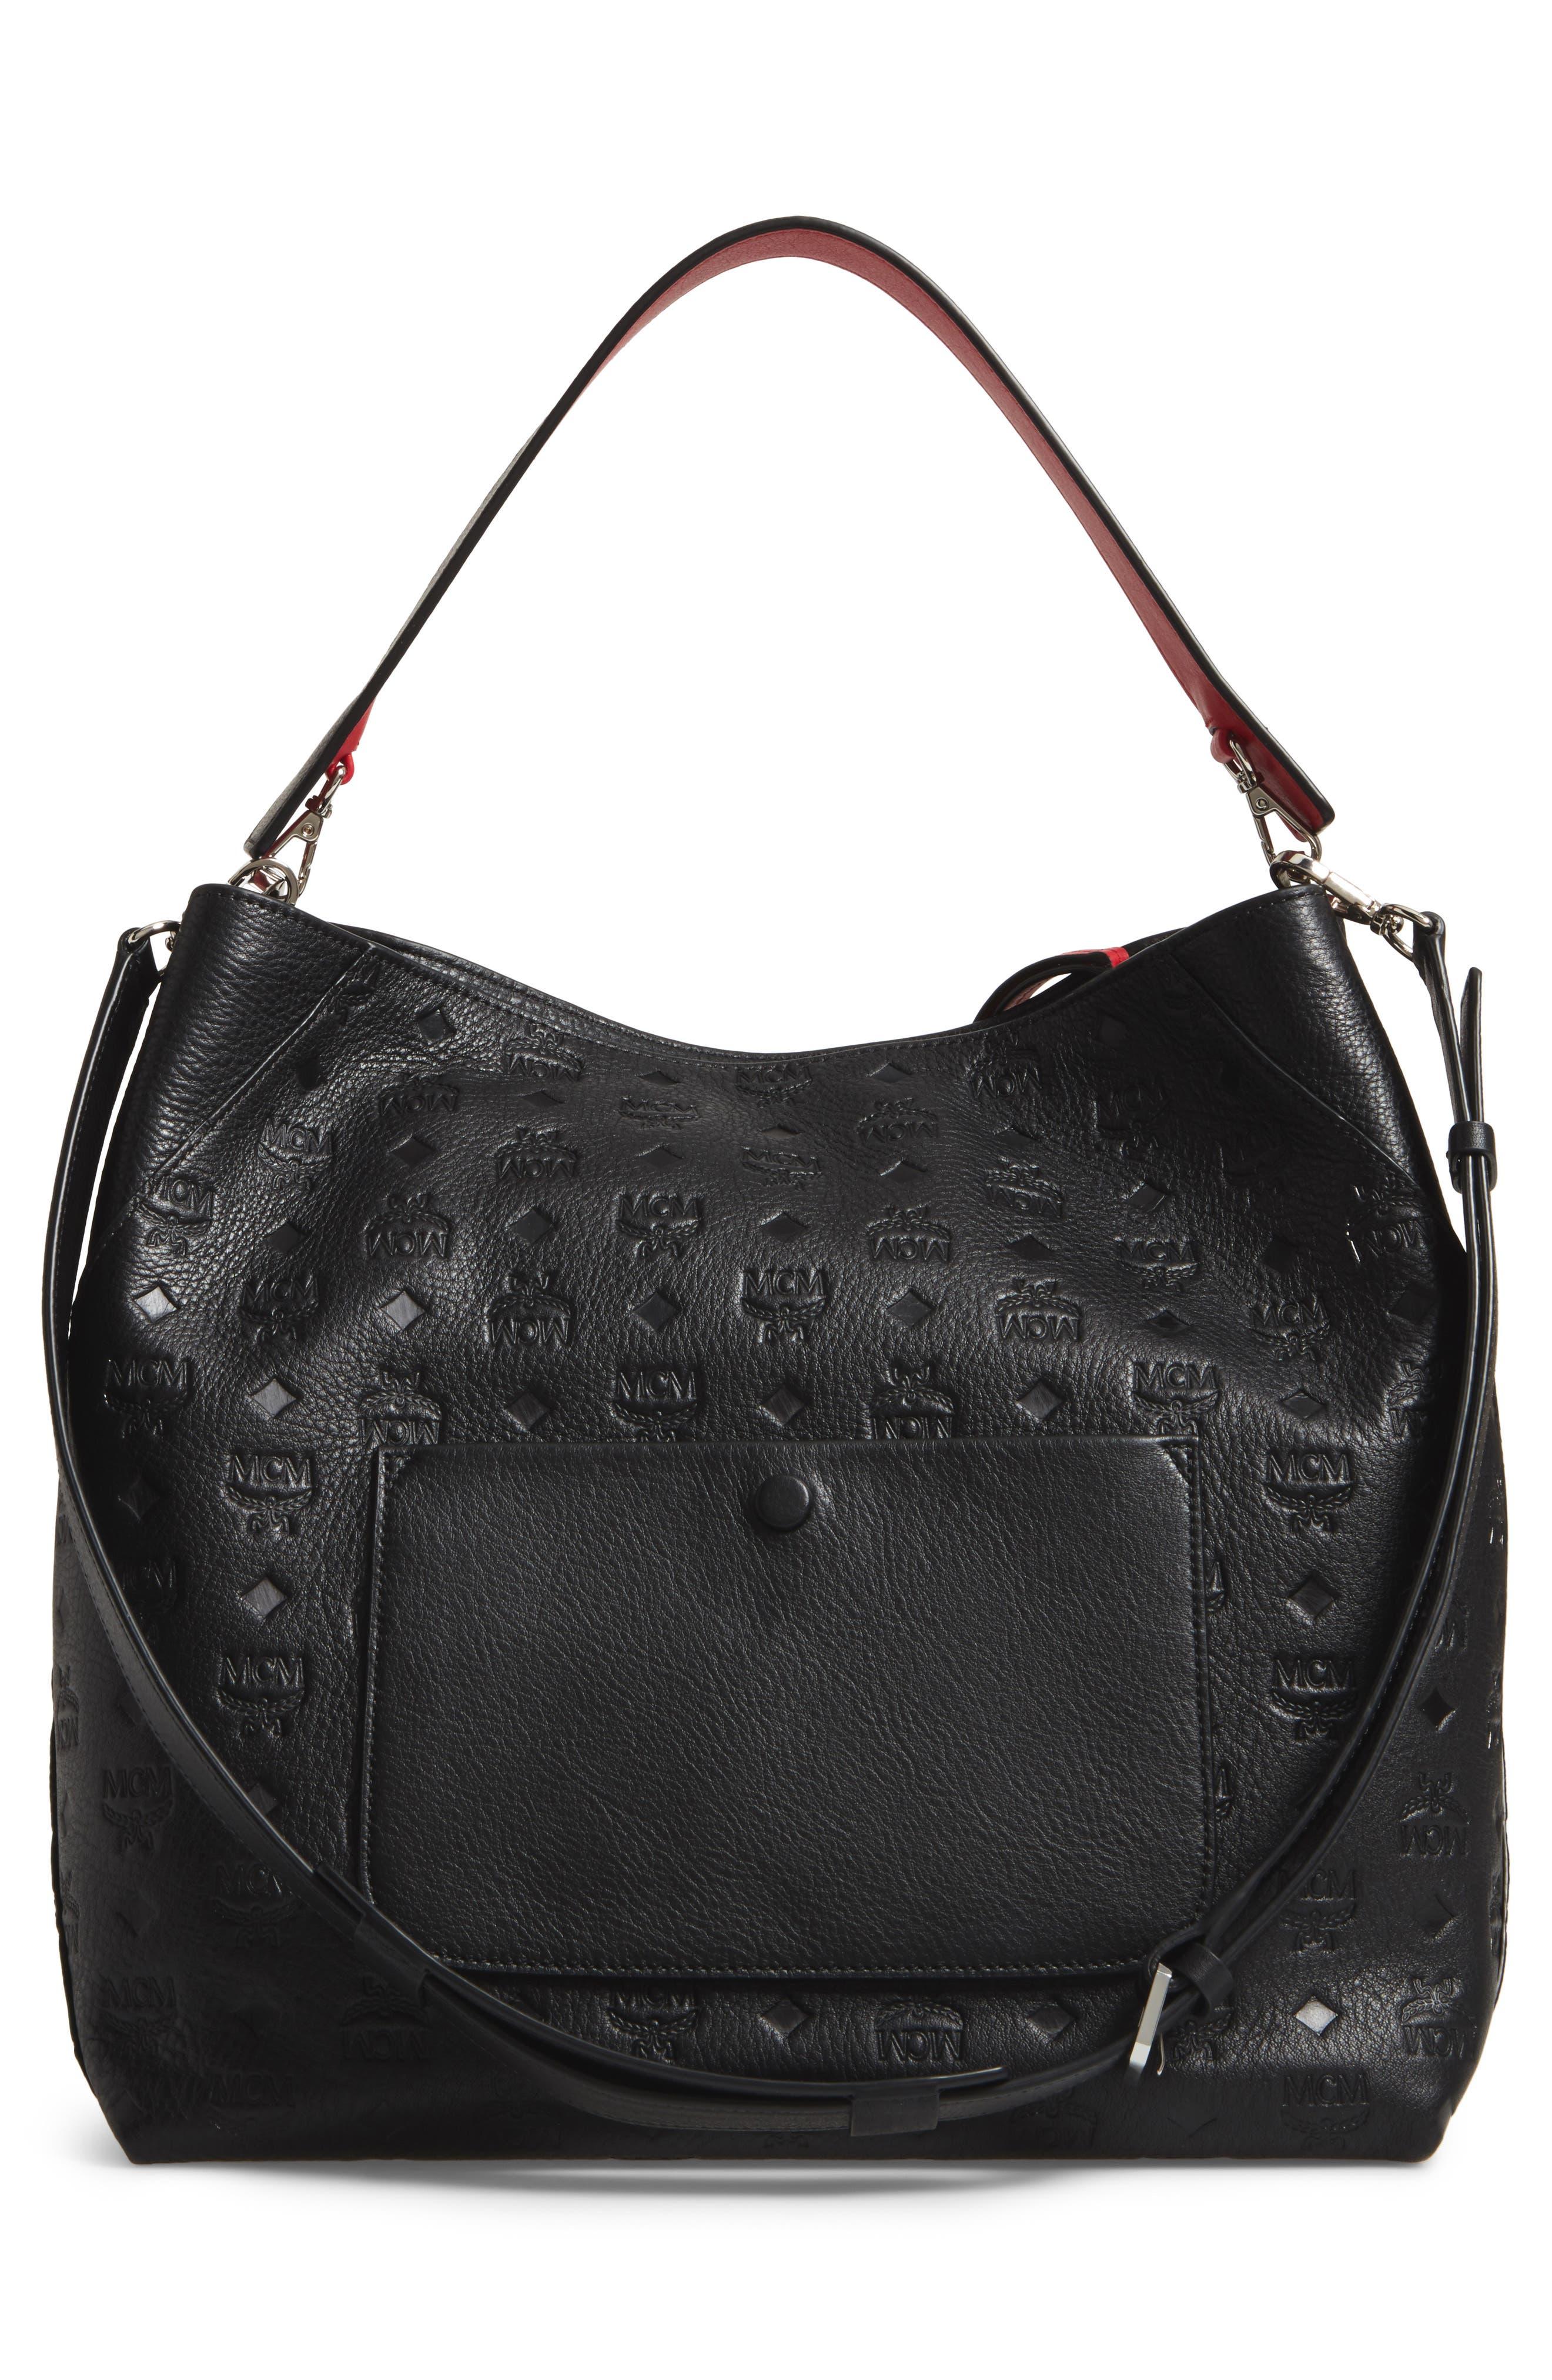 Klara Monogrammed Leather Hobo Bag,                             Alternate thumbnail 3, color,                             BLACK